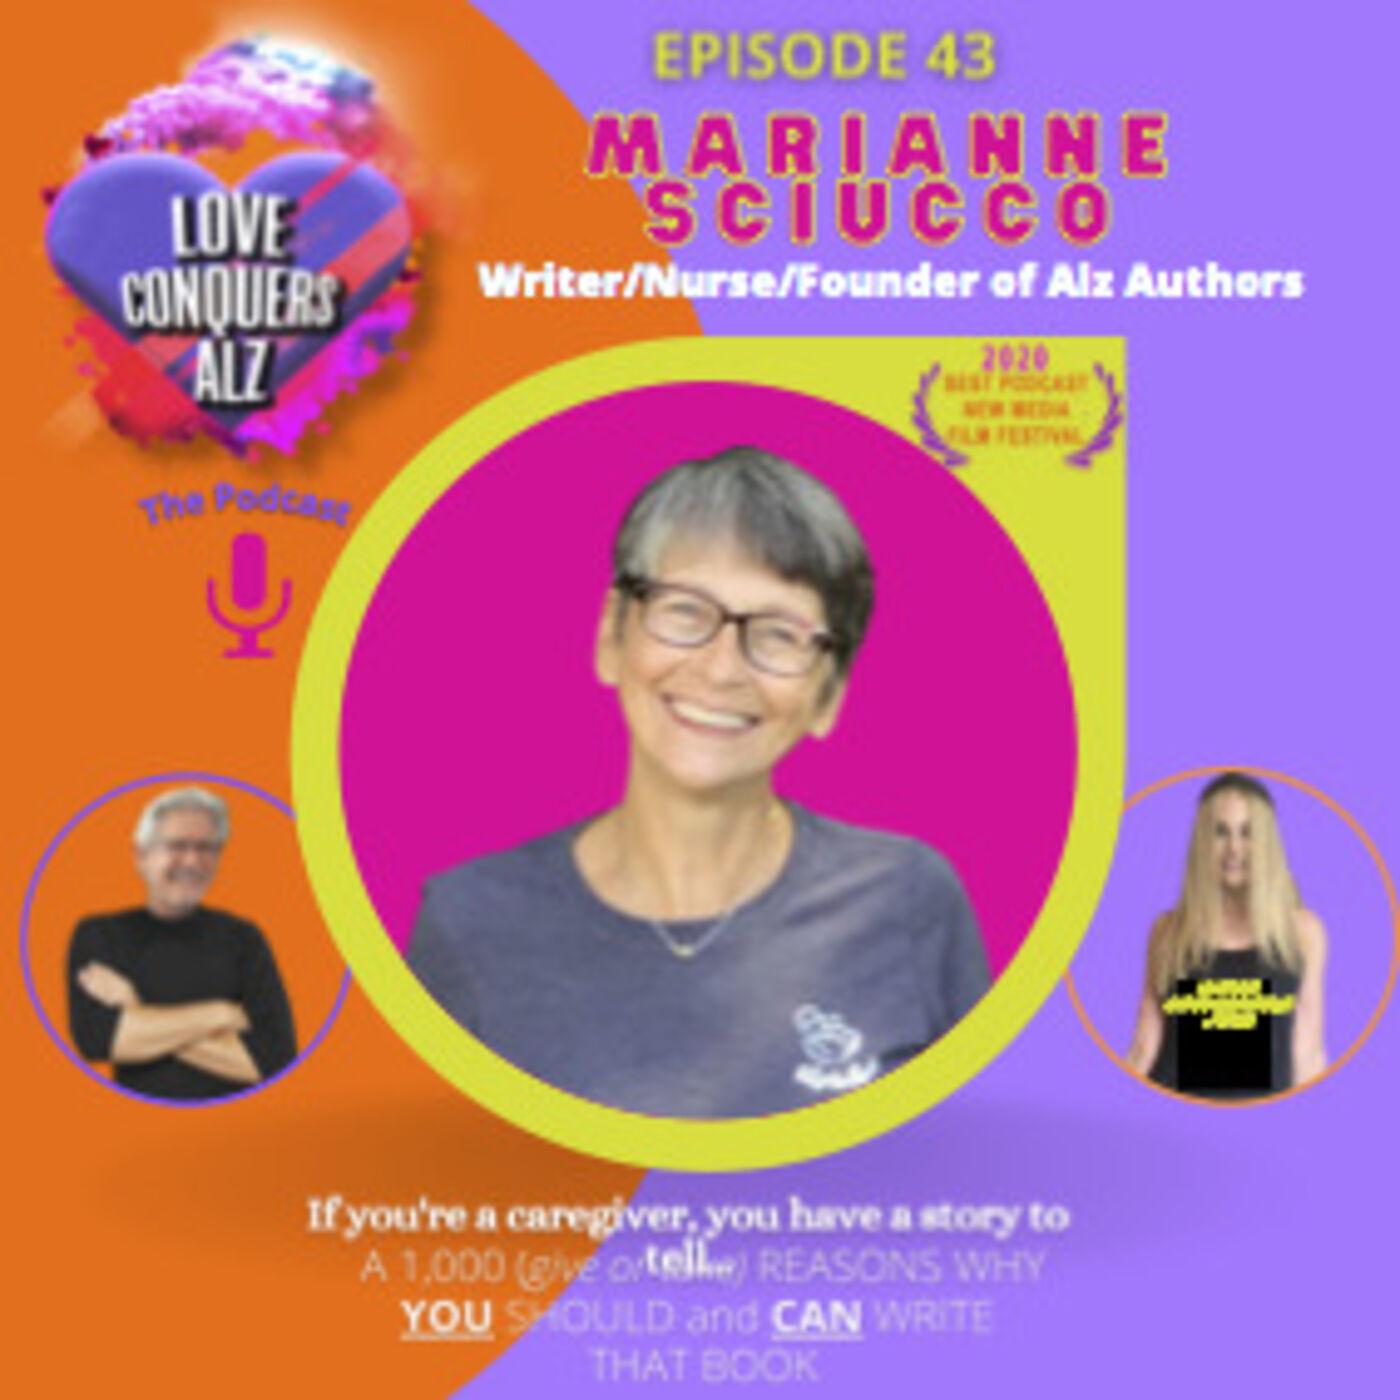 MARIANNE SCIUCCO - Author, Registered Nurse, Founder of AlzAuthors